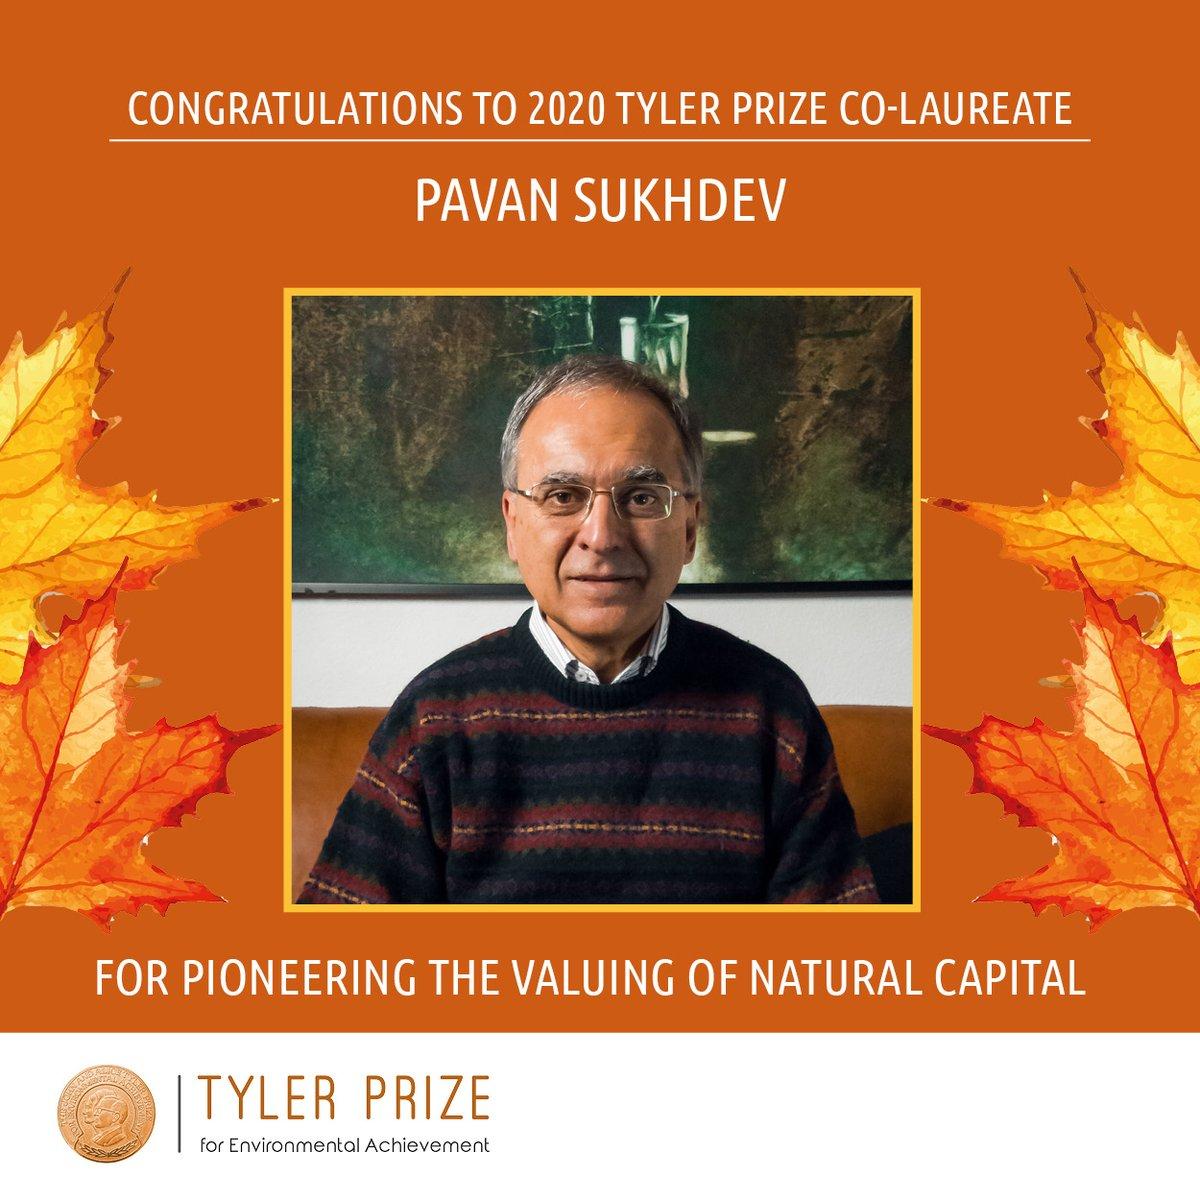 'Nobel for environment': India's Pavan Sukhdev wins Tyler Prize